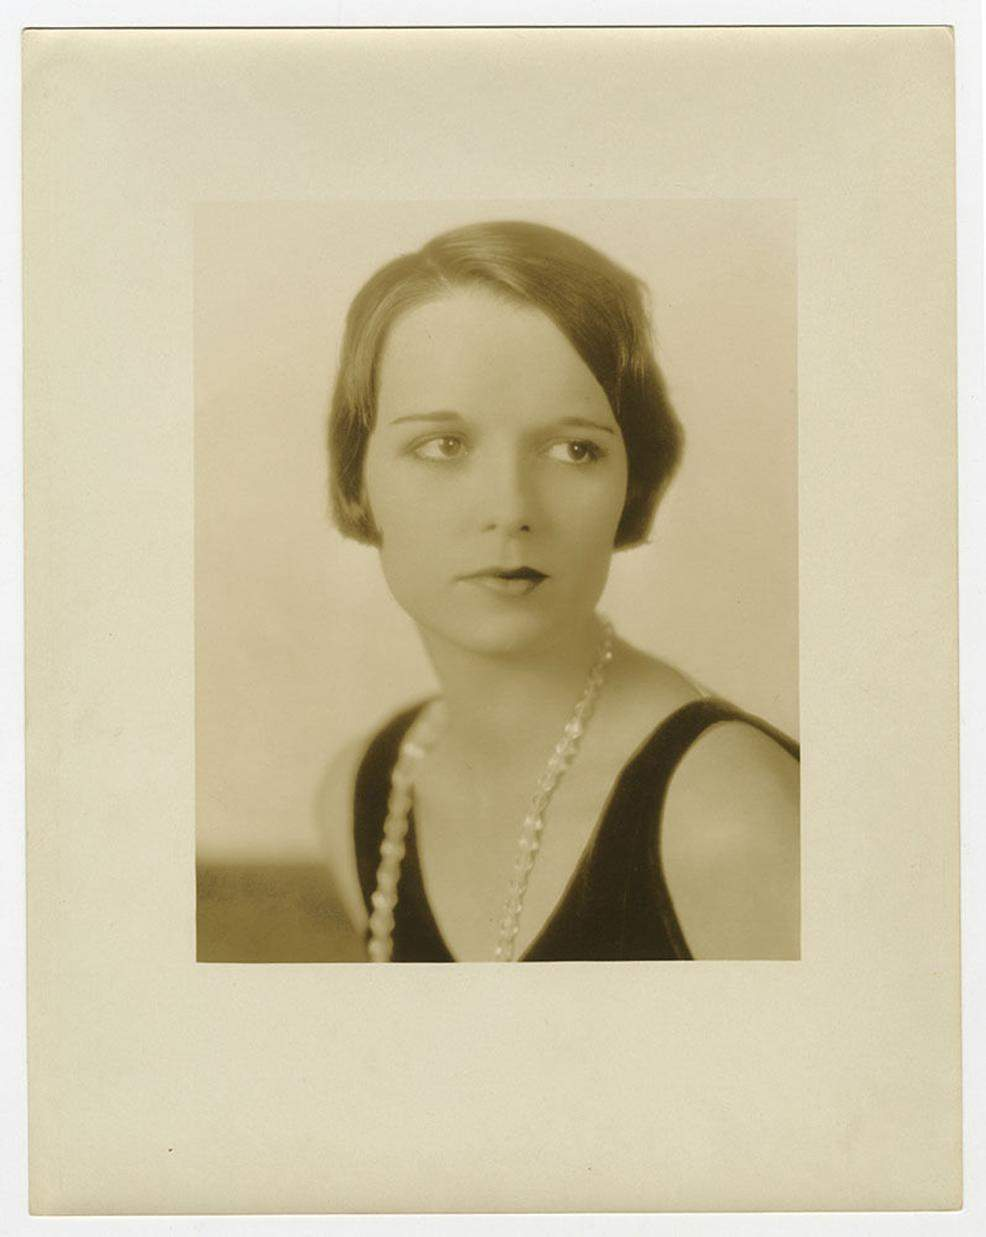 1926 Louise Brooks Publicity Still by Eugene Robert Richee 01